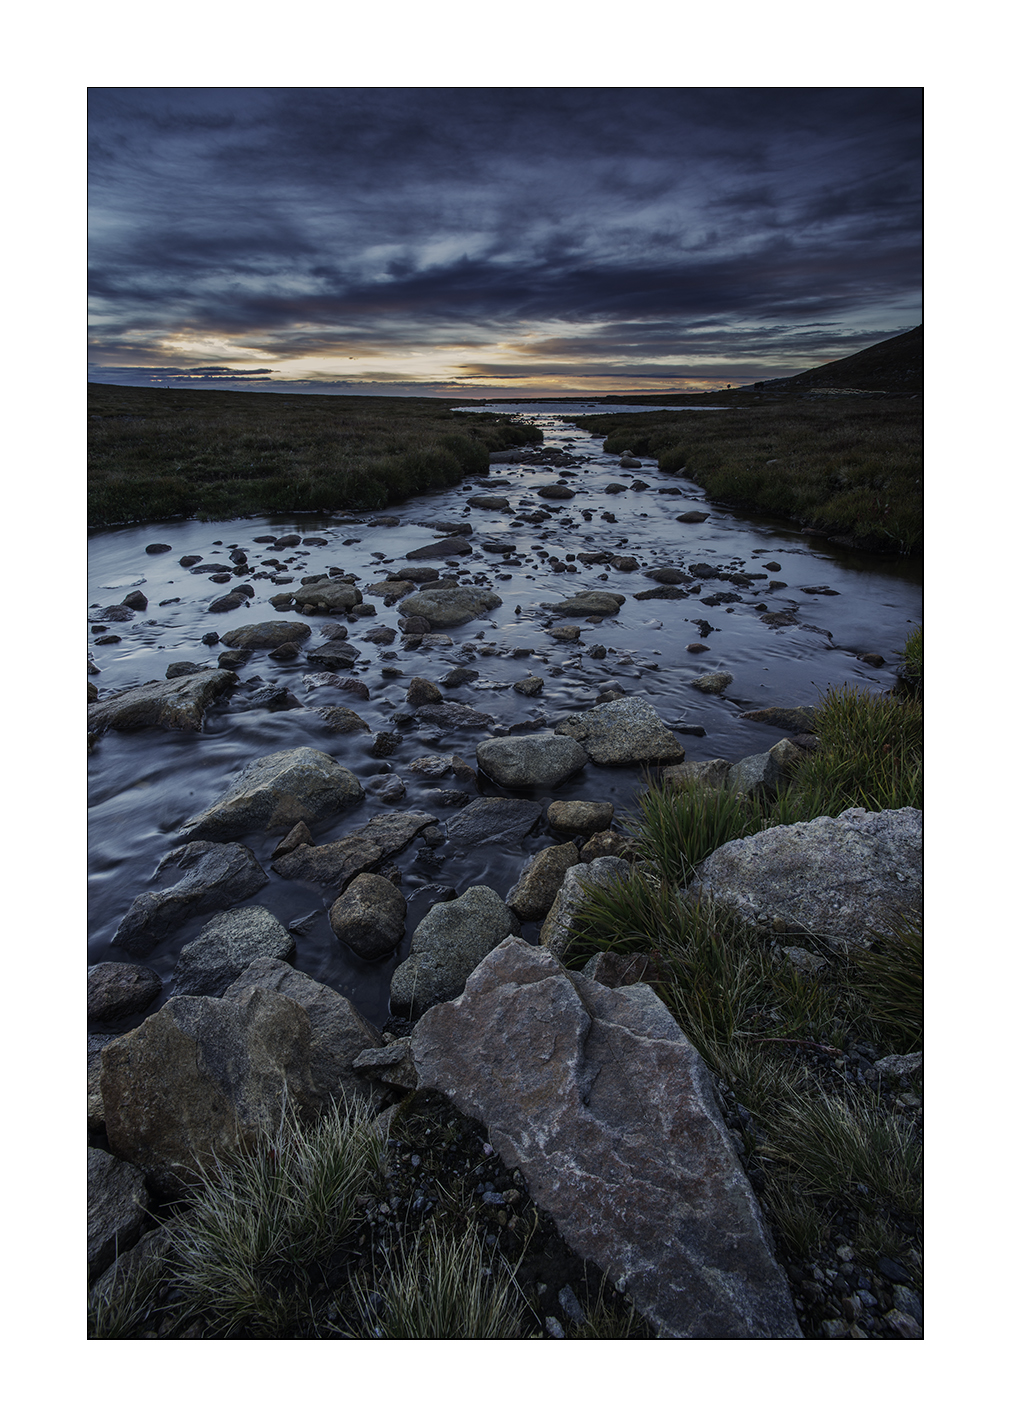 Dsc1768 by Landscapelover in Regular Member Gallery